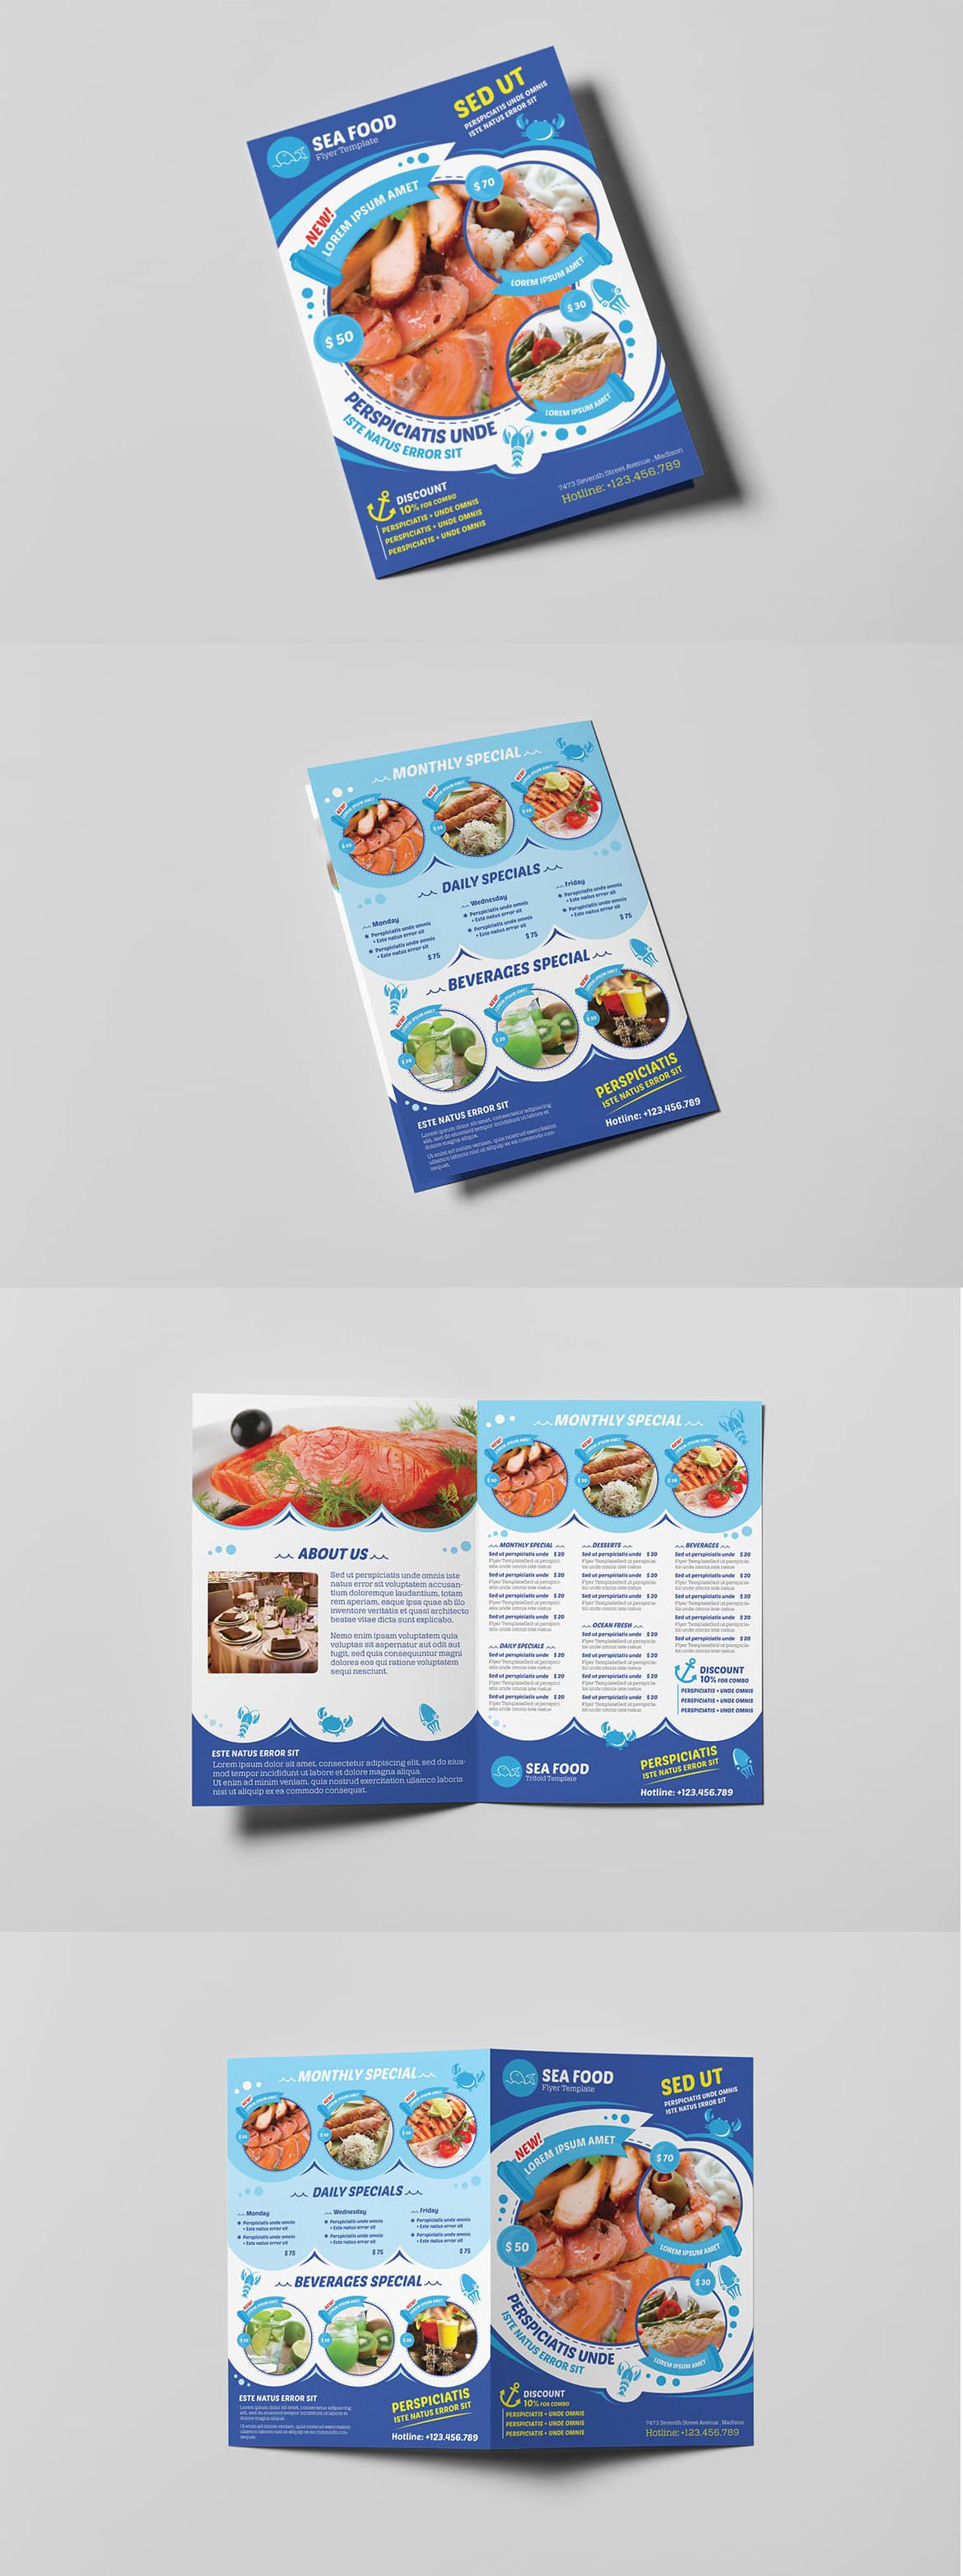 Seafood Restaurant A Brochure Leaflet Template PSD Brochure - A5 brochure template